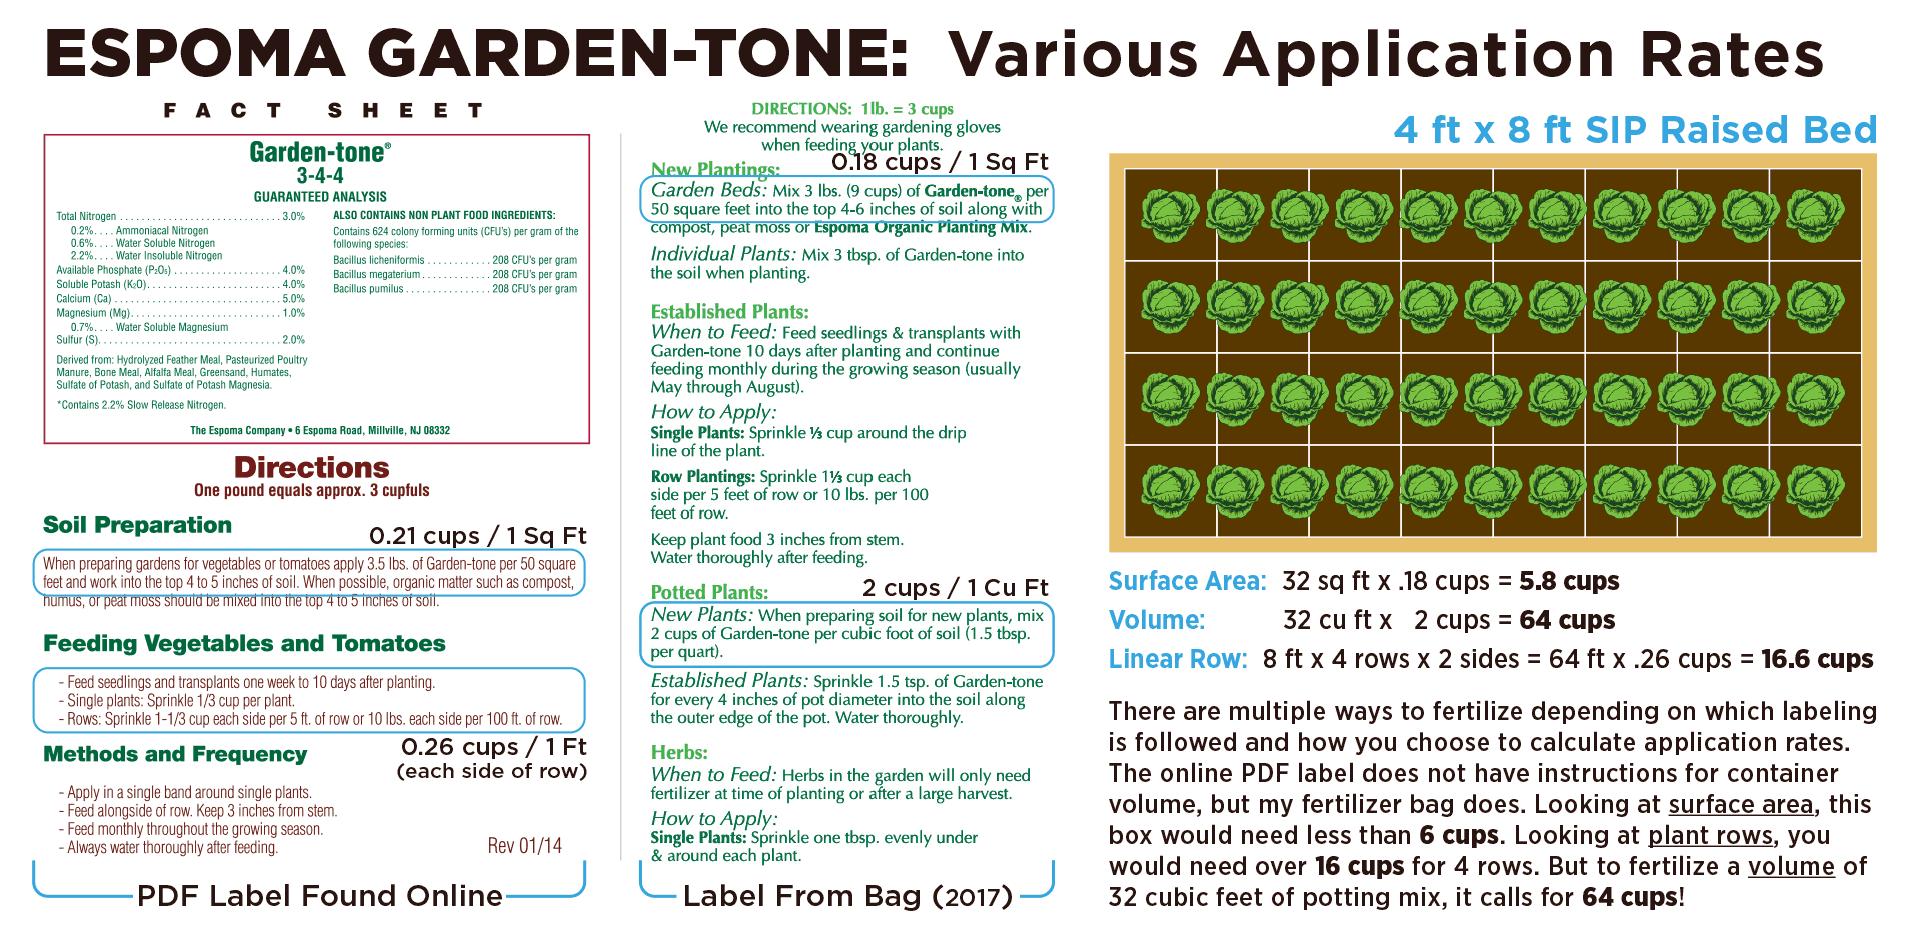 Fertilizer Application Rates: Container Gardening -Self